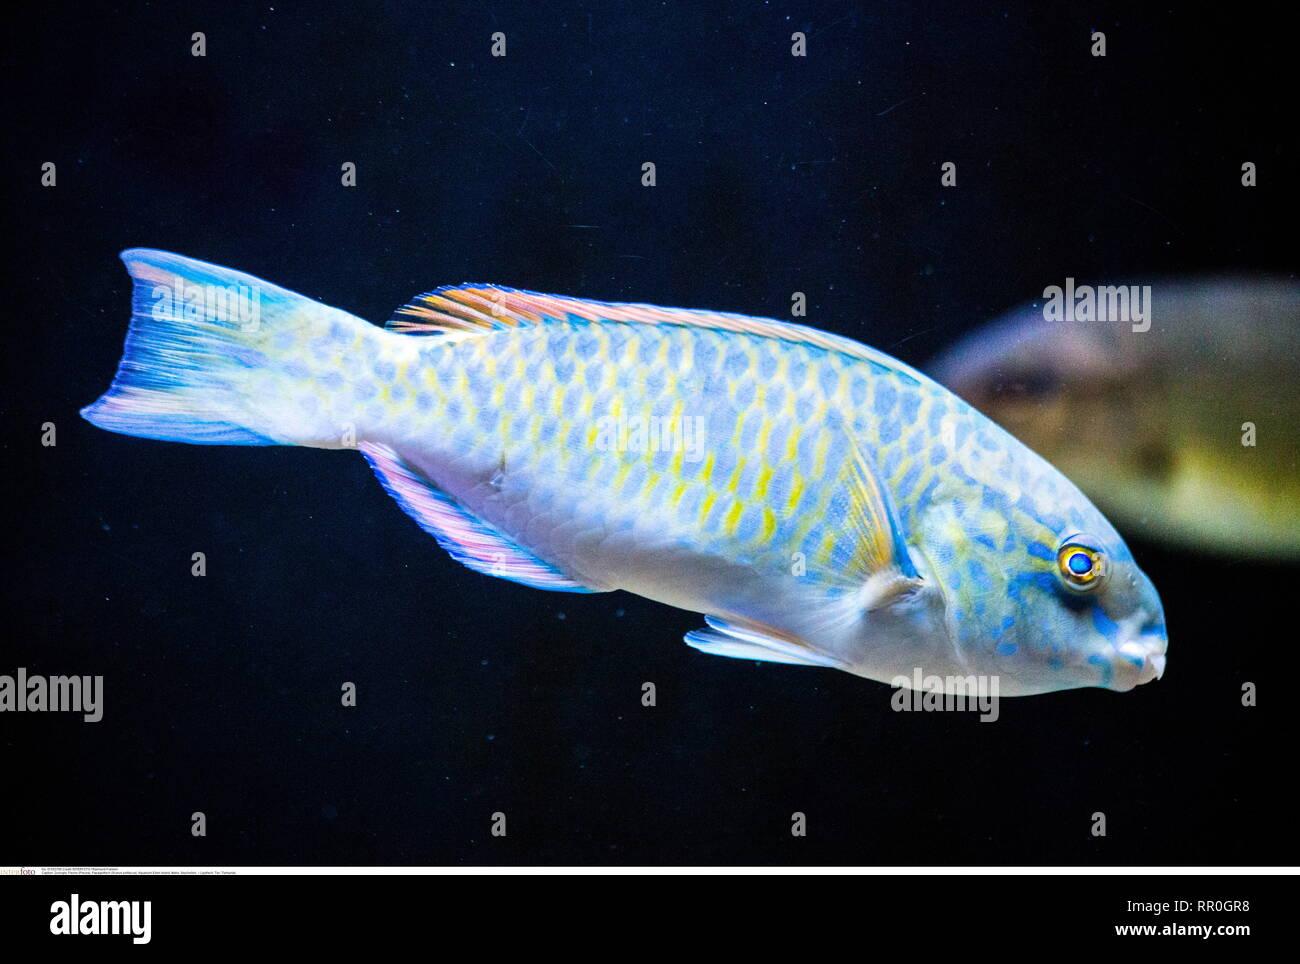 Lippfisch, Stufe, Tierkunde, Additional-Rights - Clearance-Info - Not-Available Stockbild